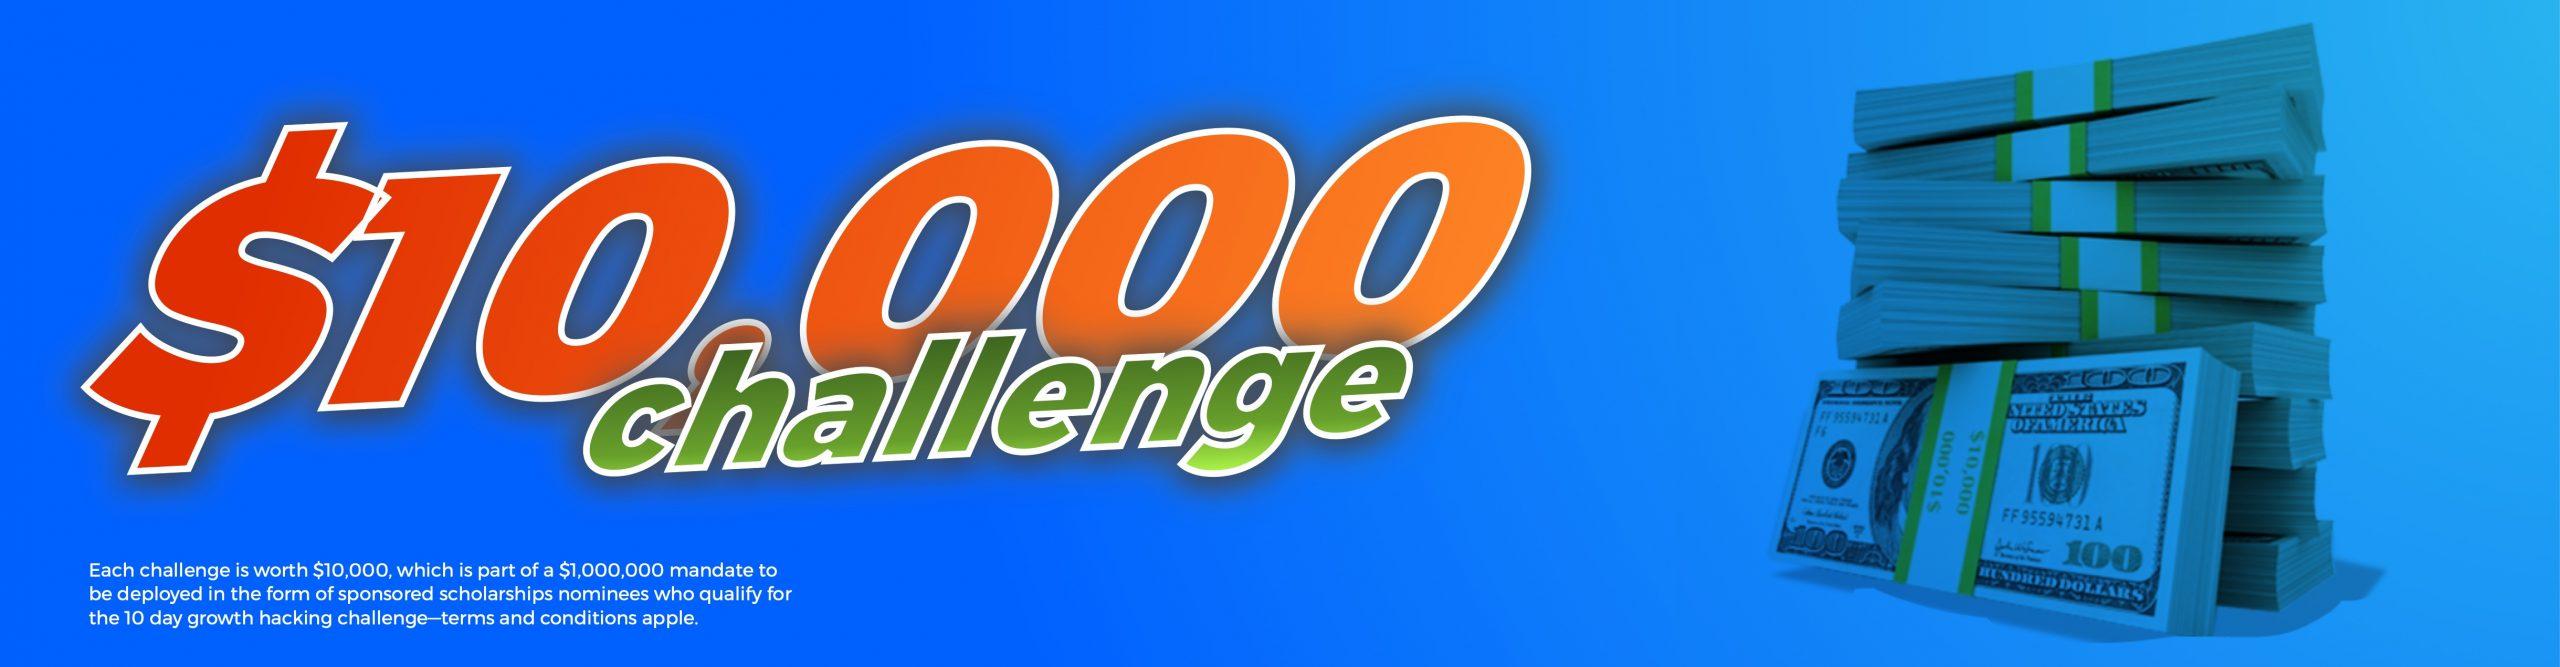 10,000 challenge banner